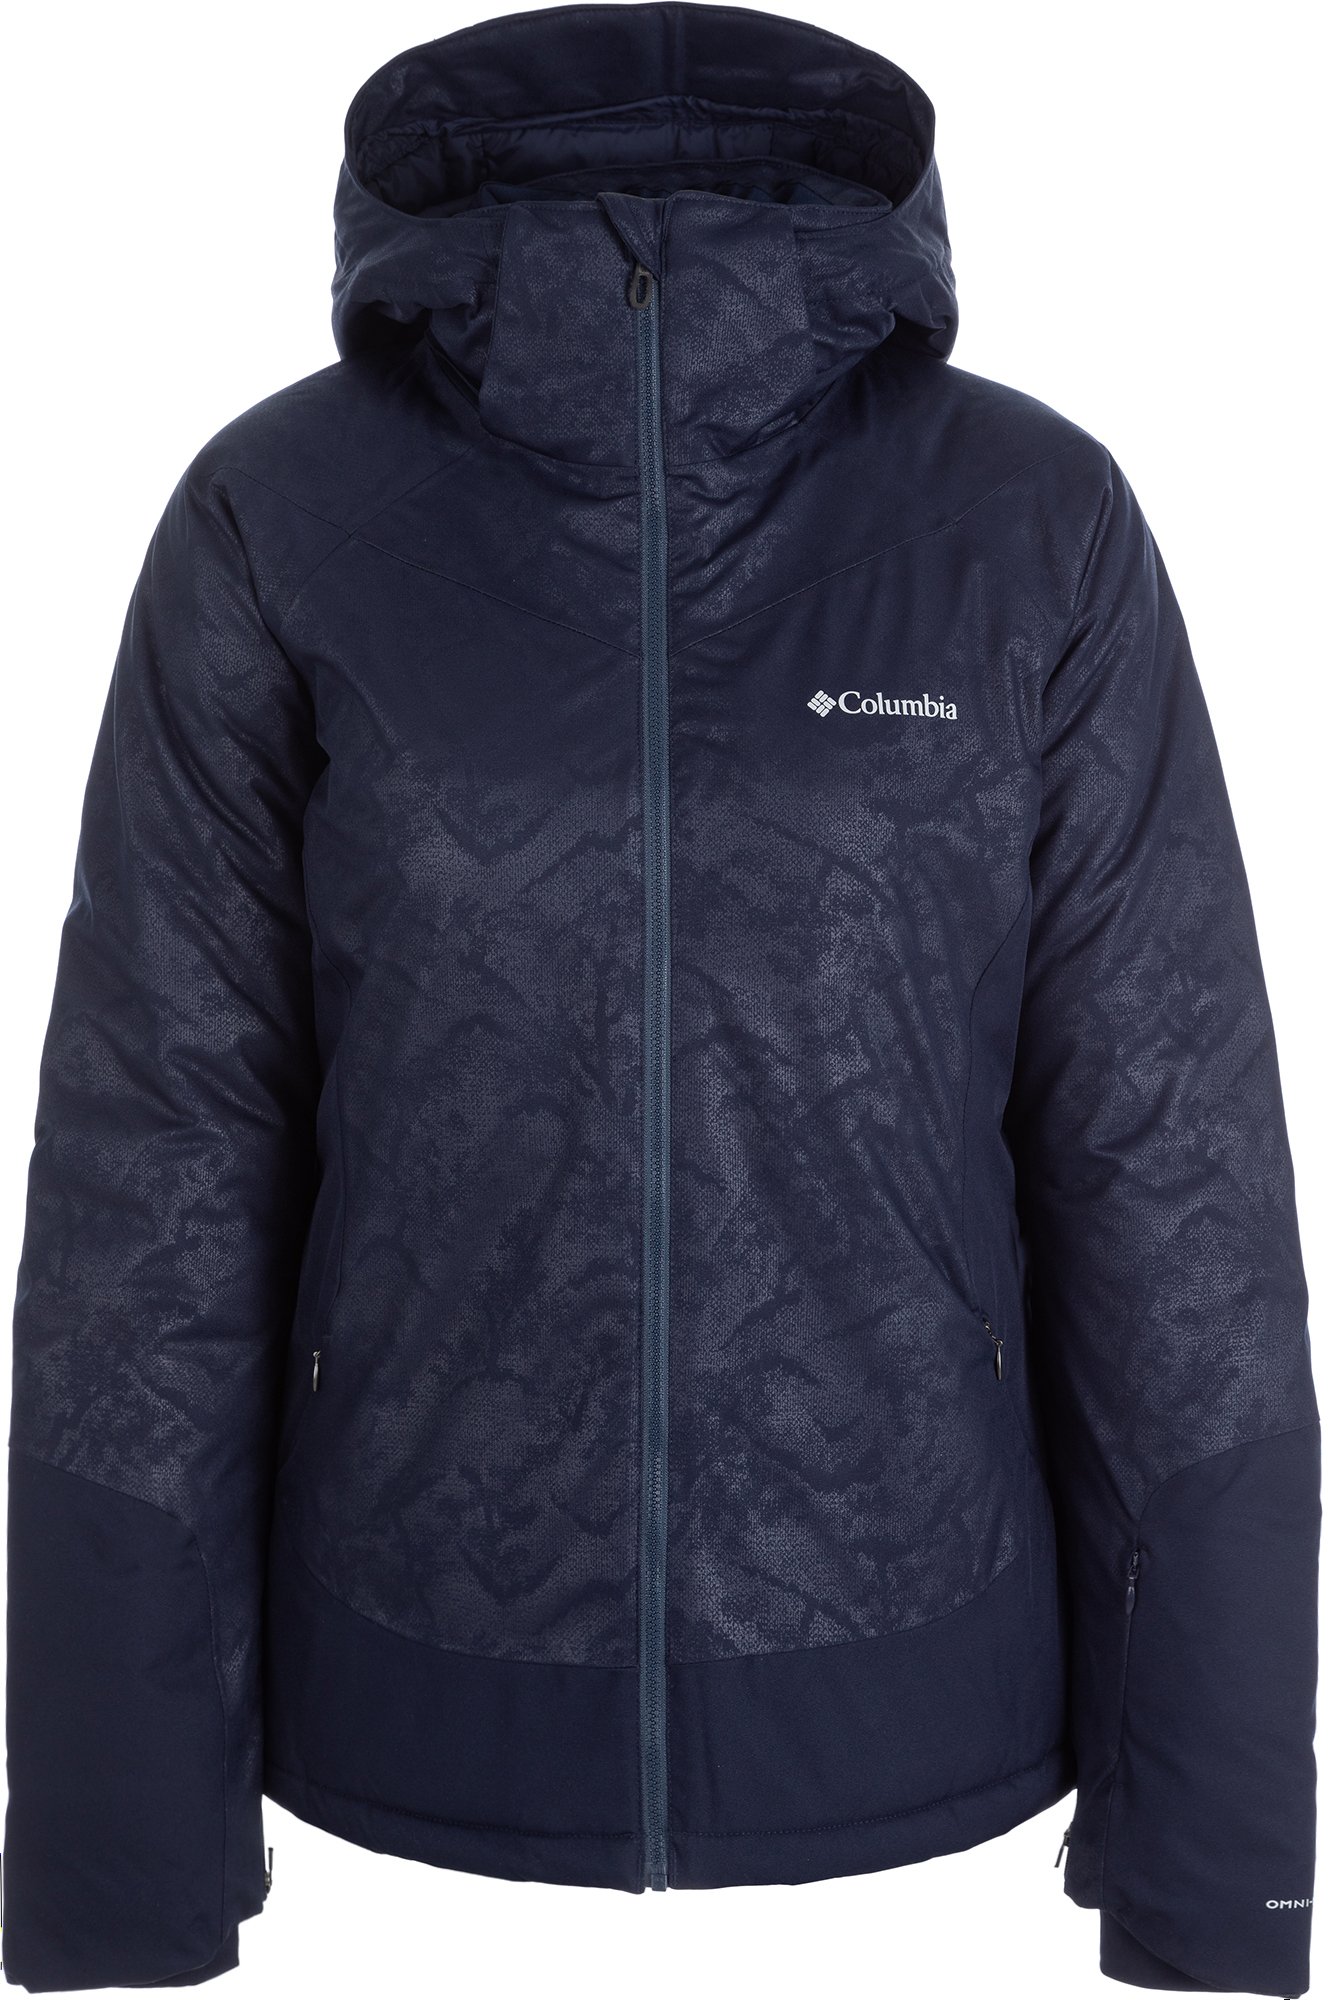 Columbia Куртка утепленная женская Veloca Vixen, размер 50